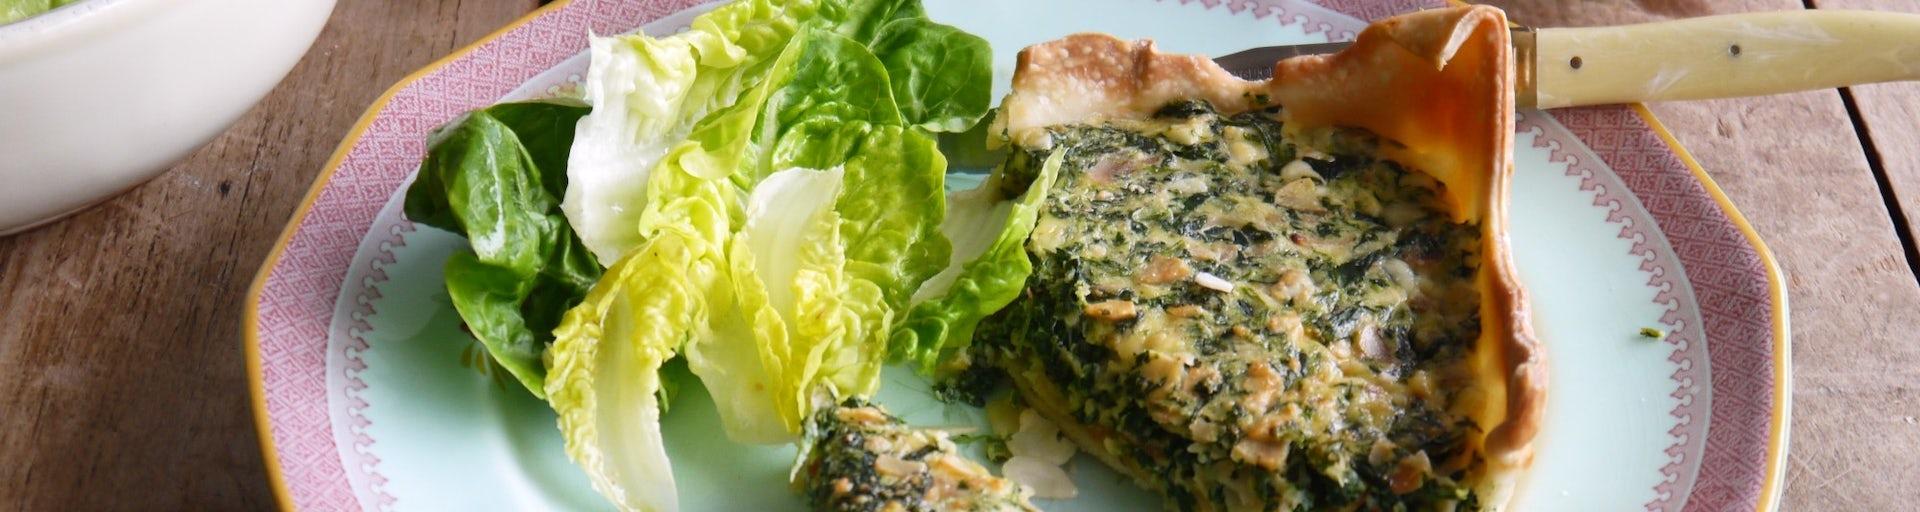 Maaltijdbox-spinazietaart-a-la-jamie-oliver-close